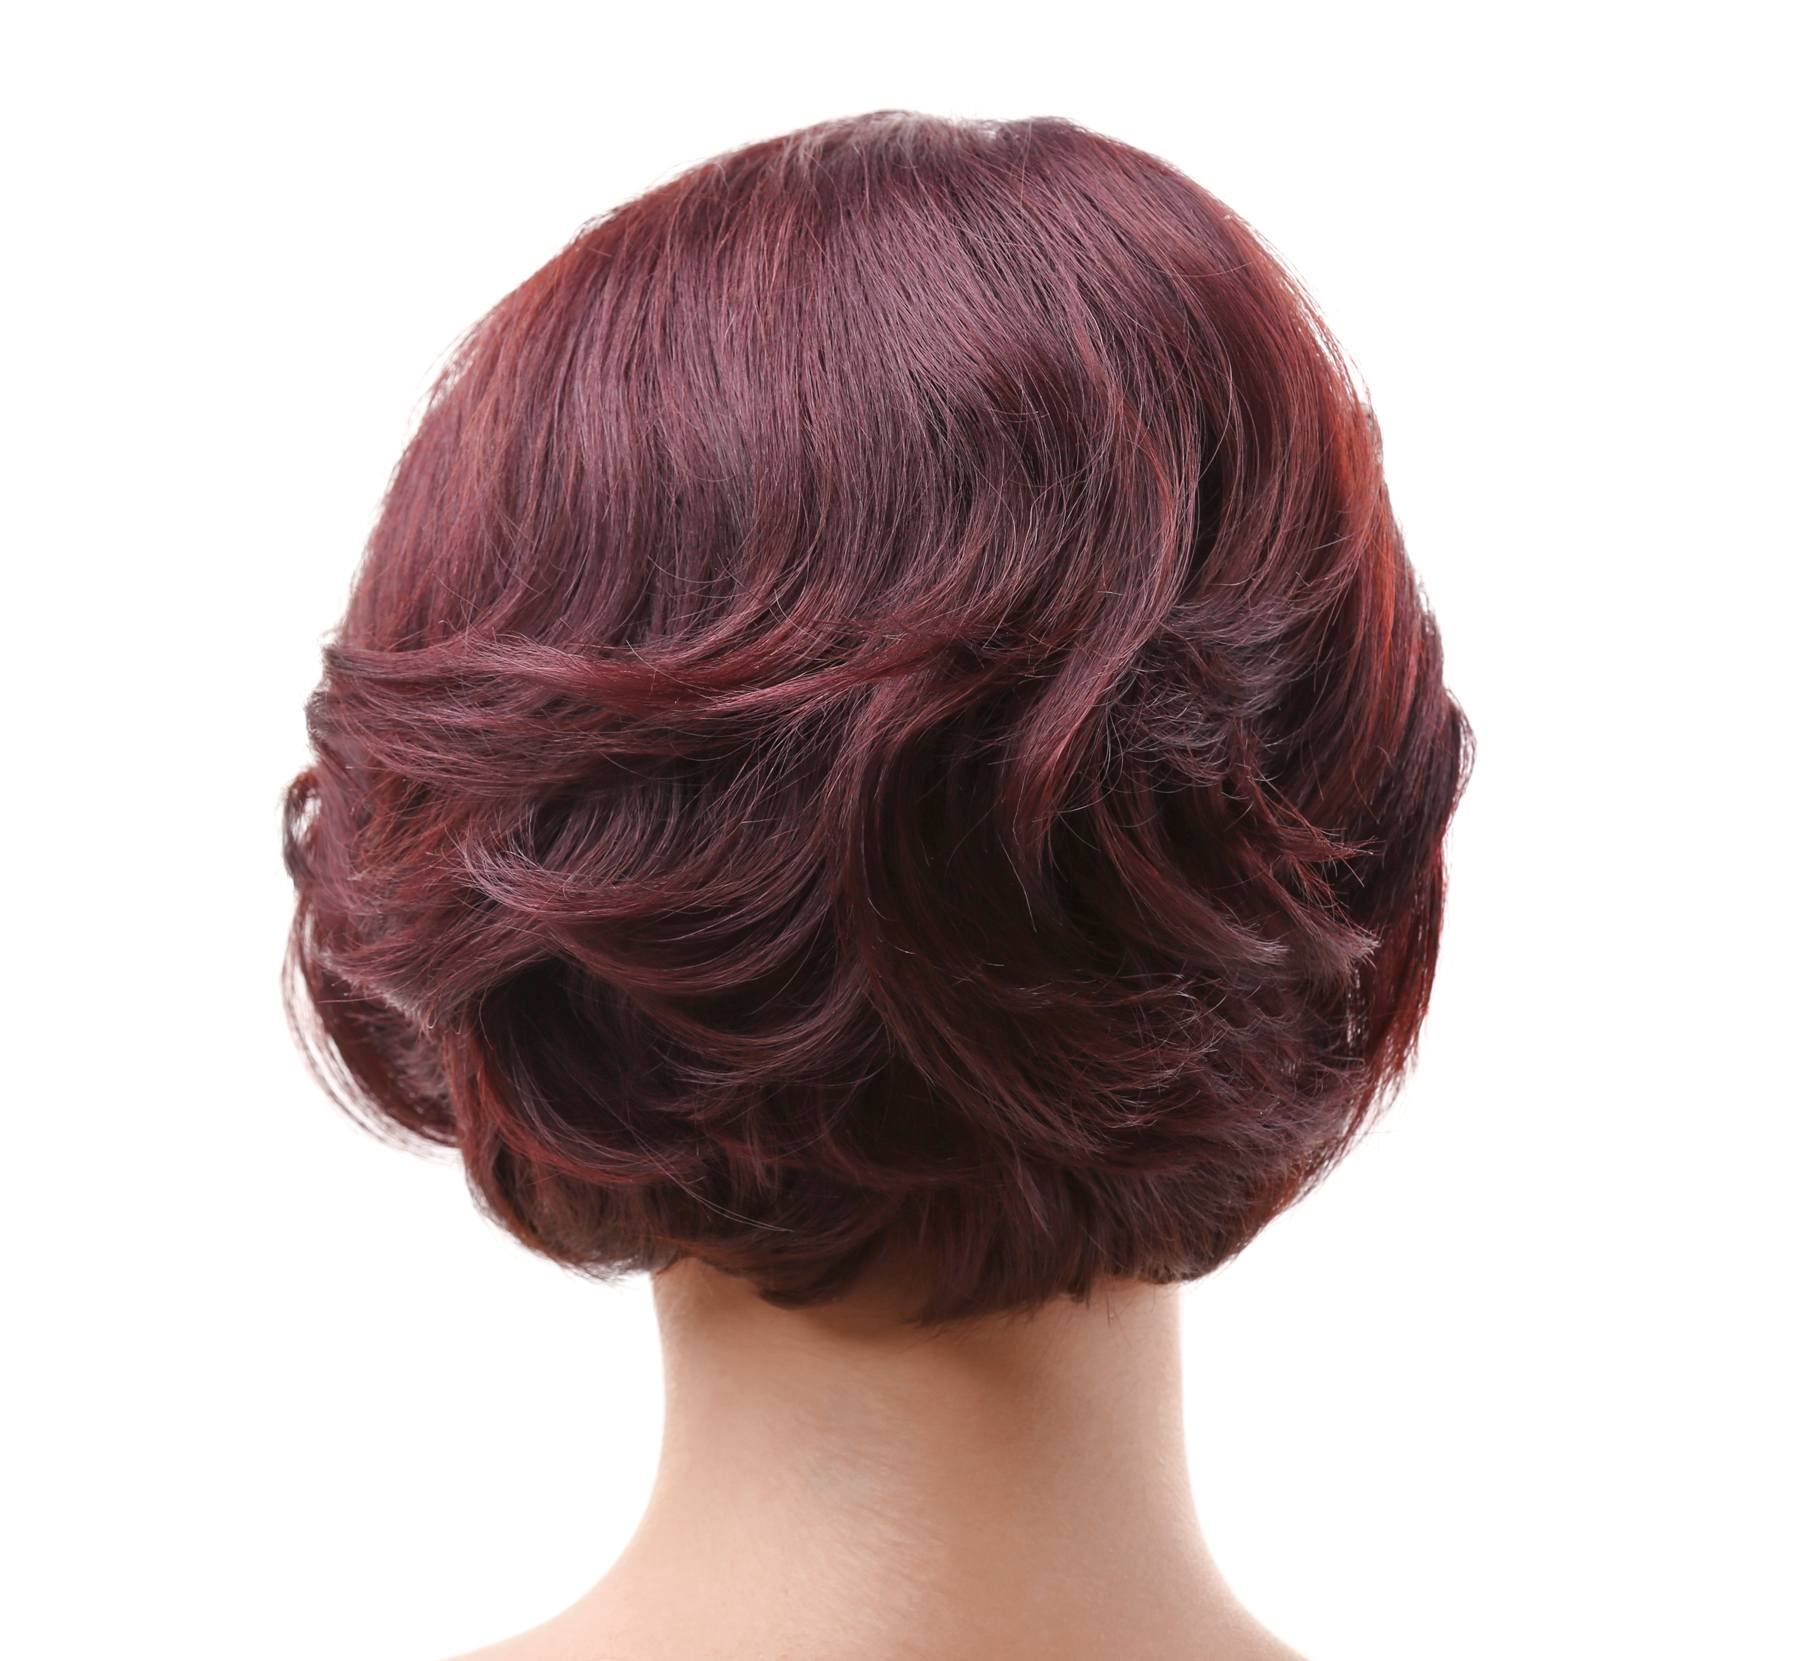 Warna rambut merah maroon deep red.